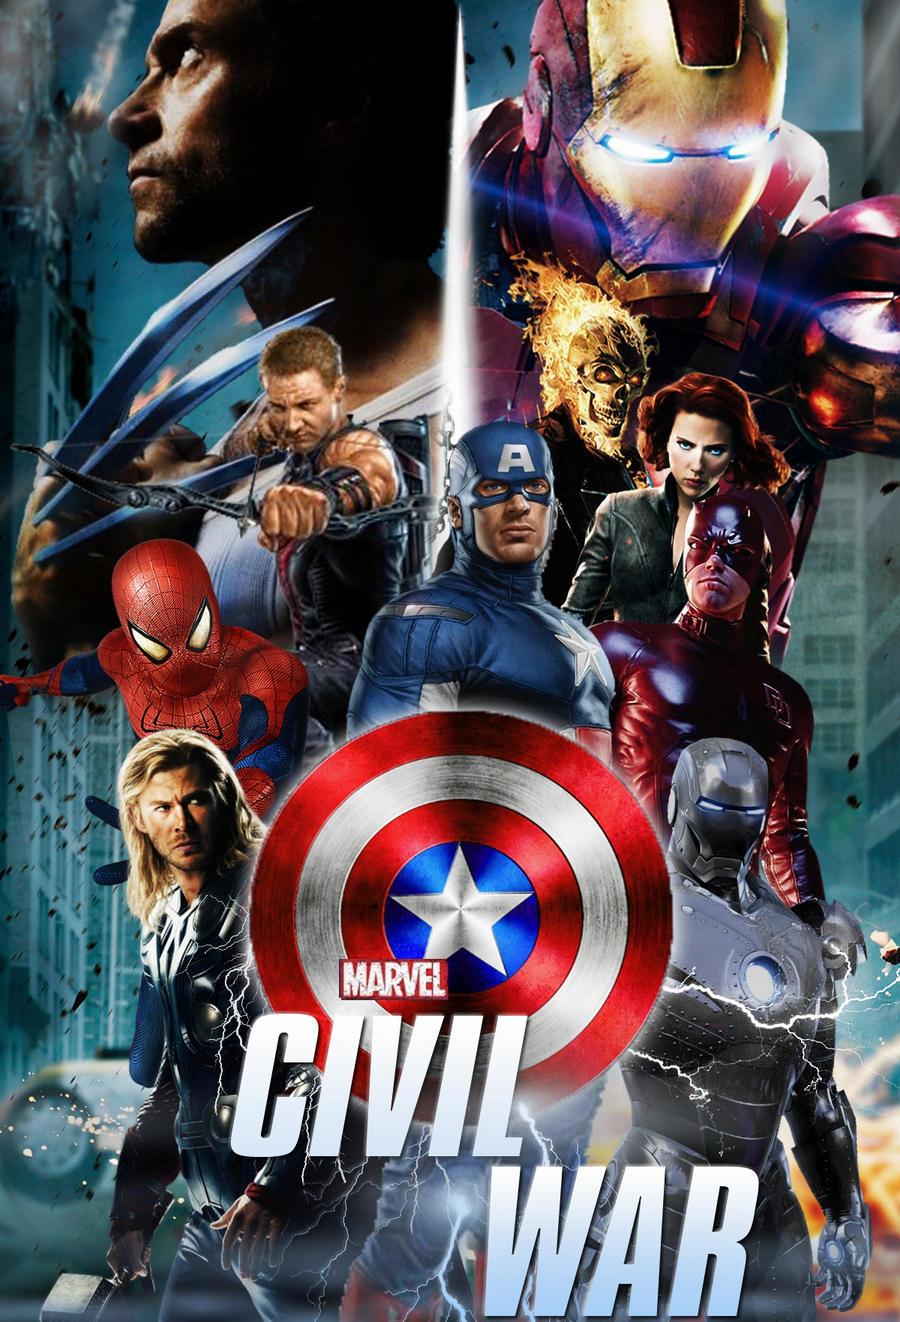 marvels civil war fan poster by stephencanlas on deviantart